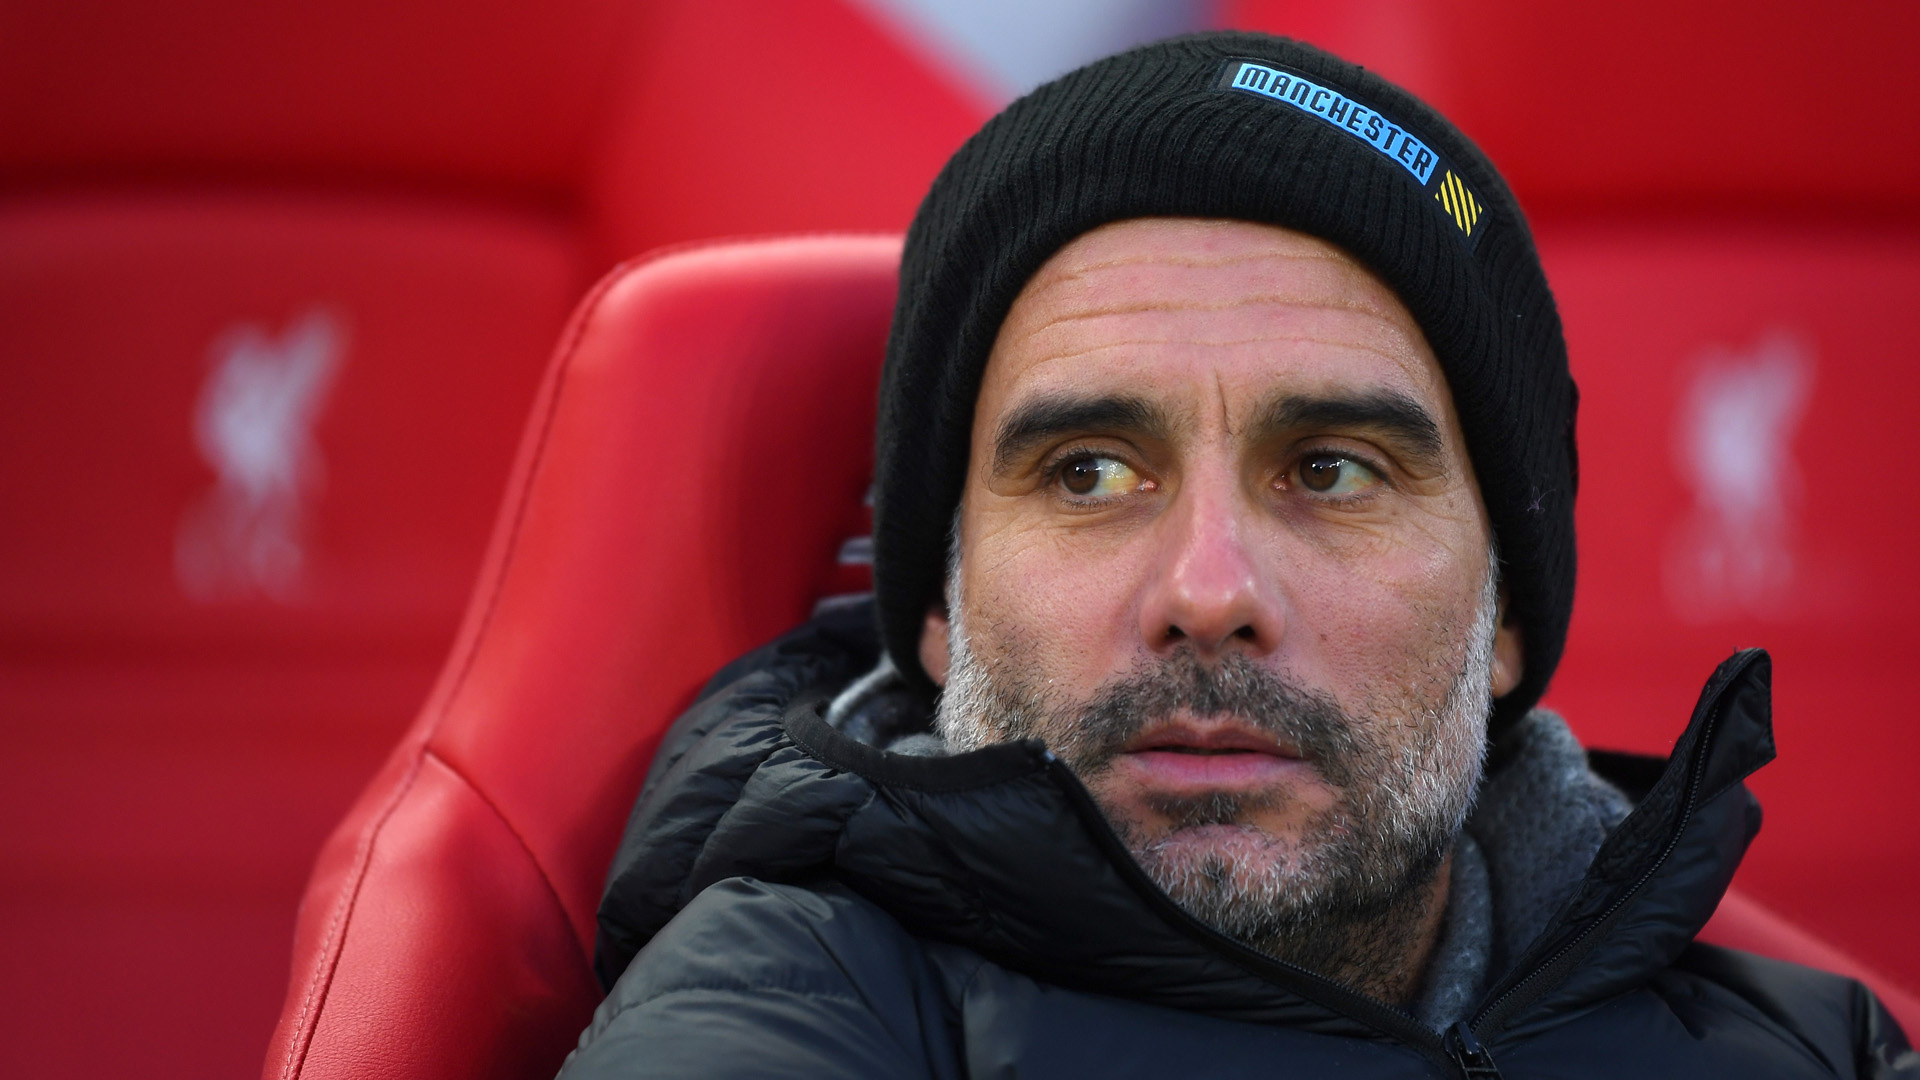 Annoncé au Bayern Munich, Pep Guardiola va rester à Manchester City